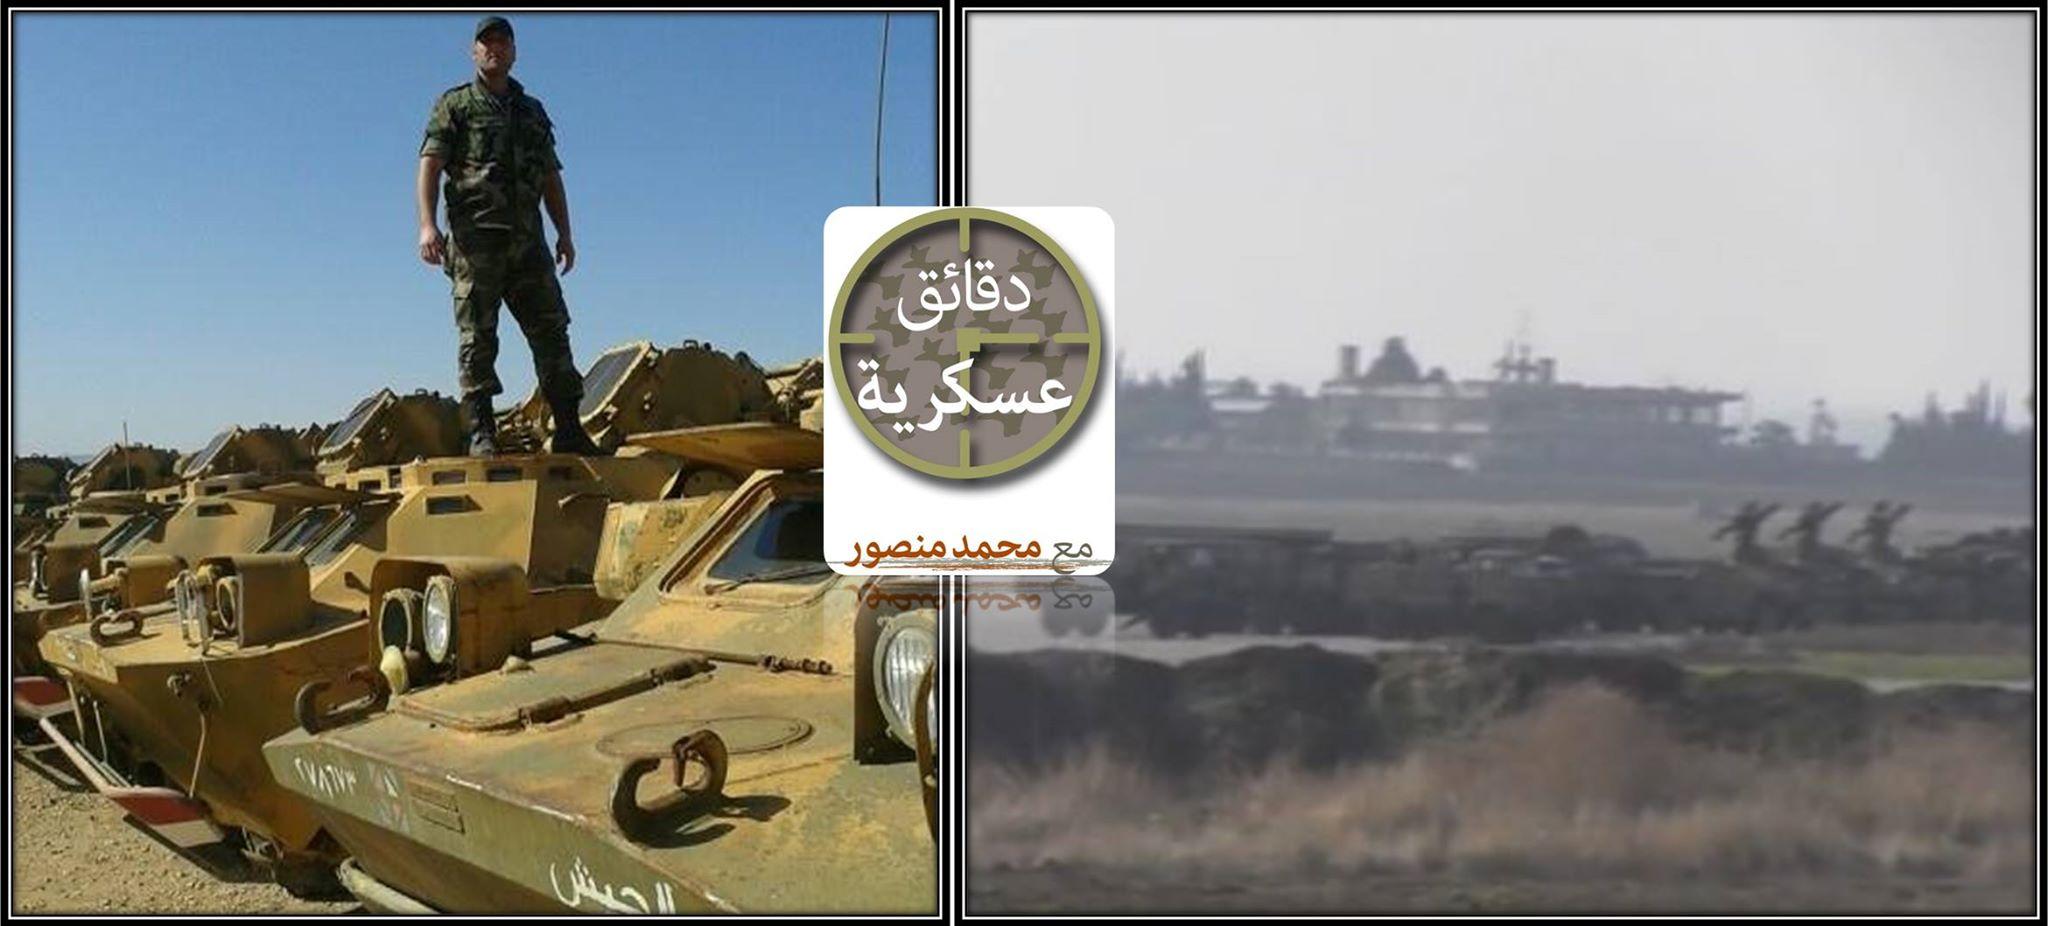 military-minutes-syria-qameshli